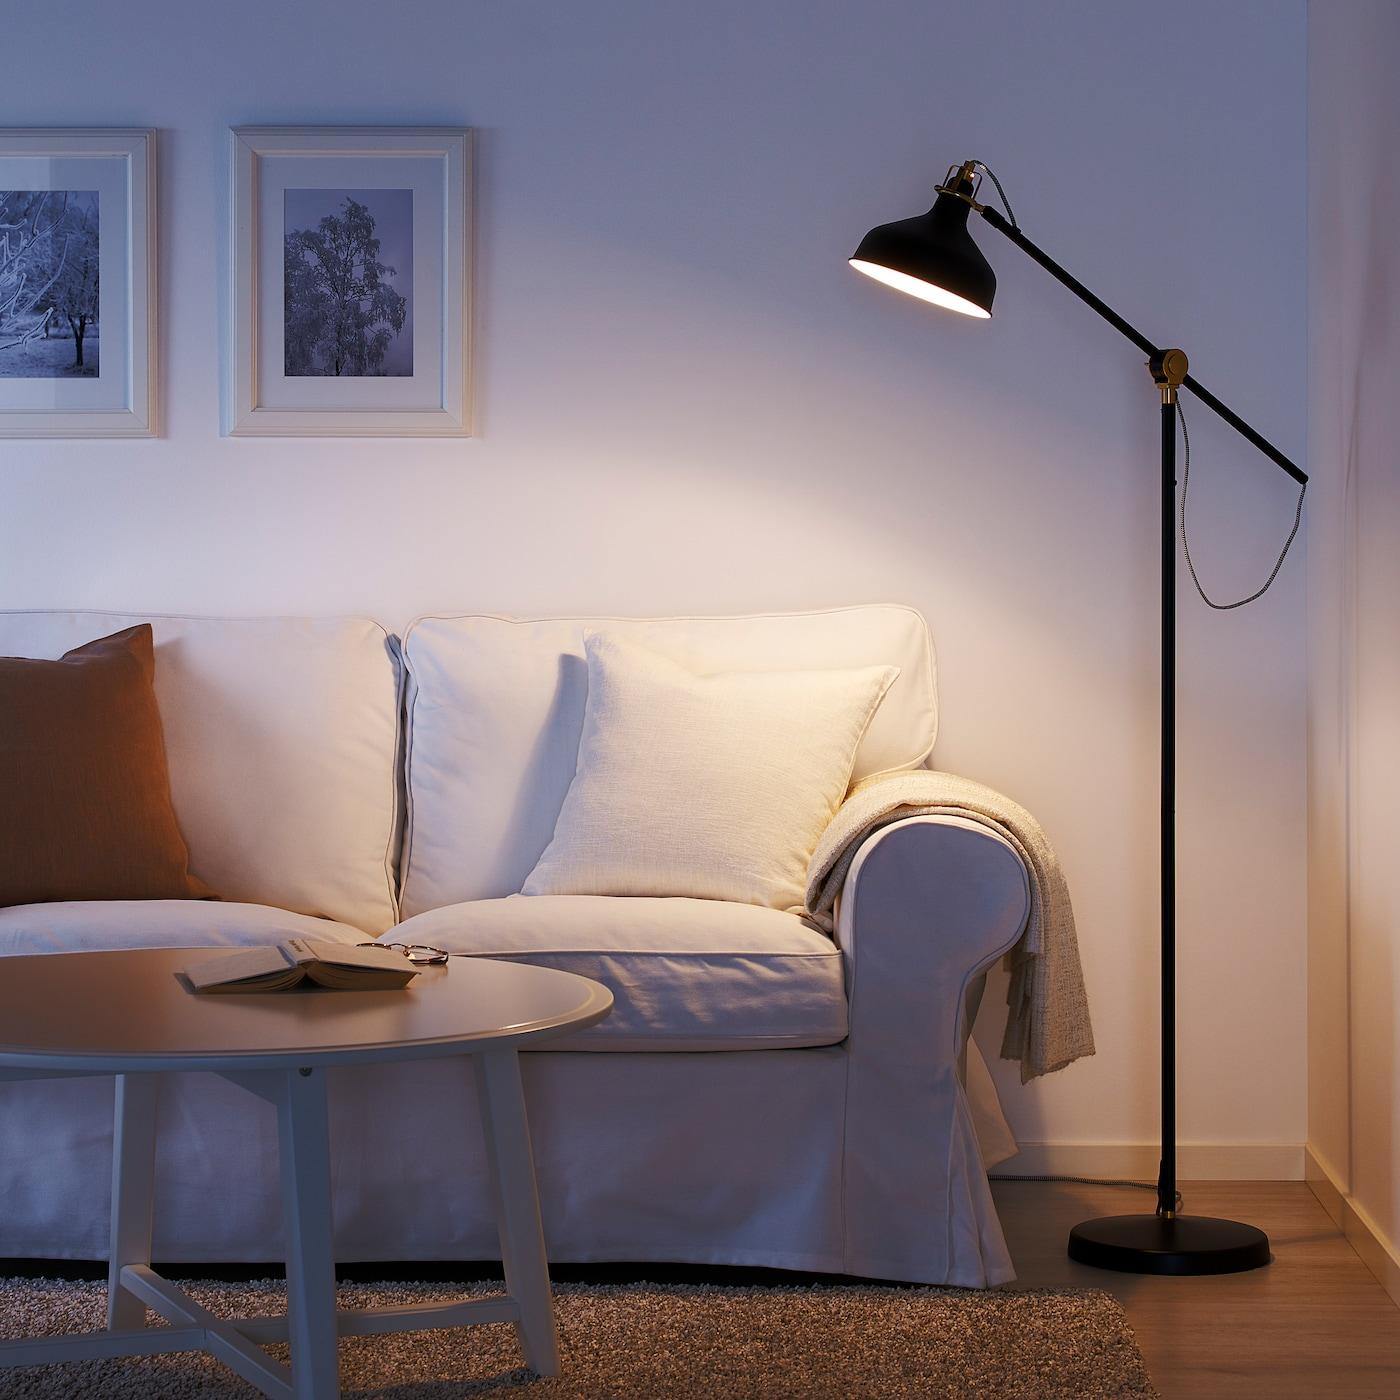 RANARP off white, Floorreading lamp IKEA